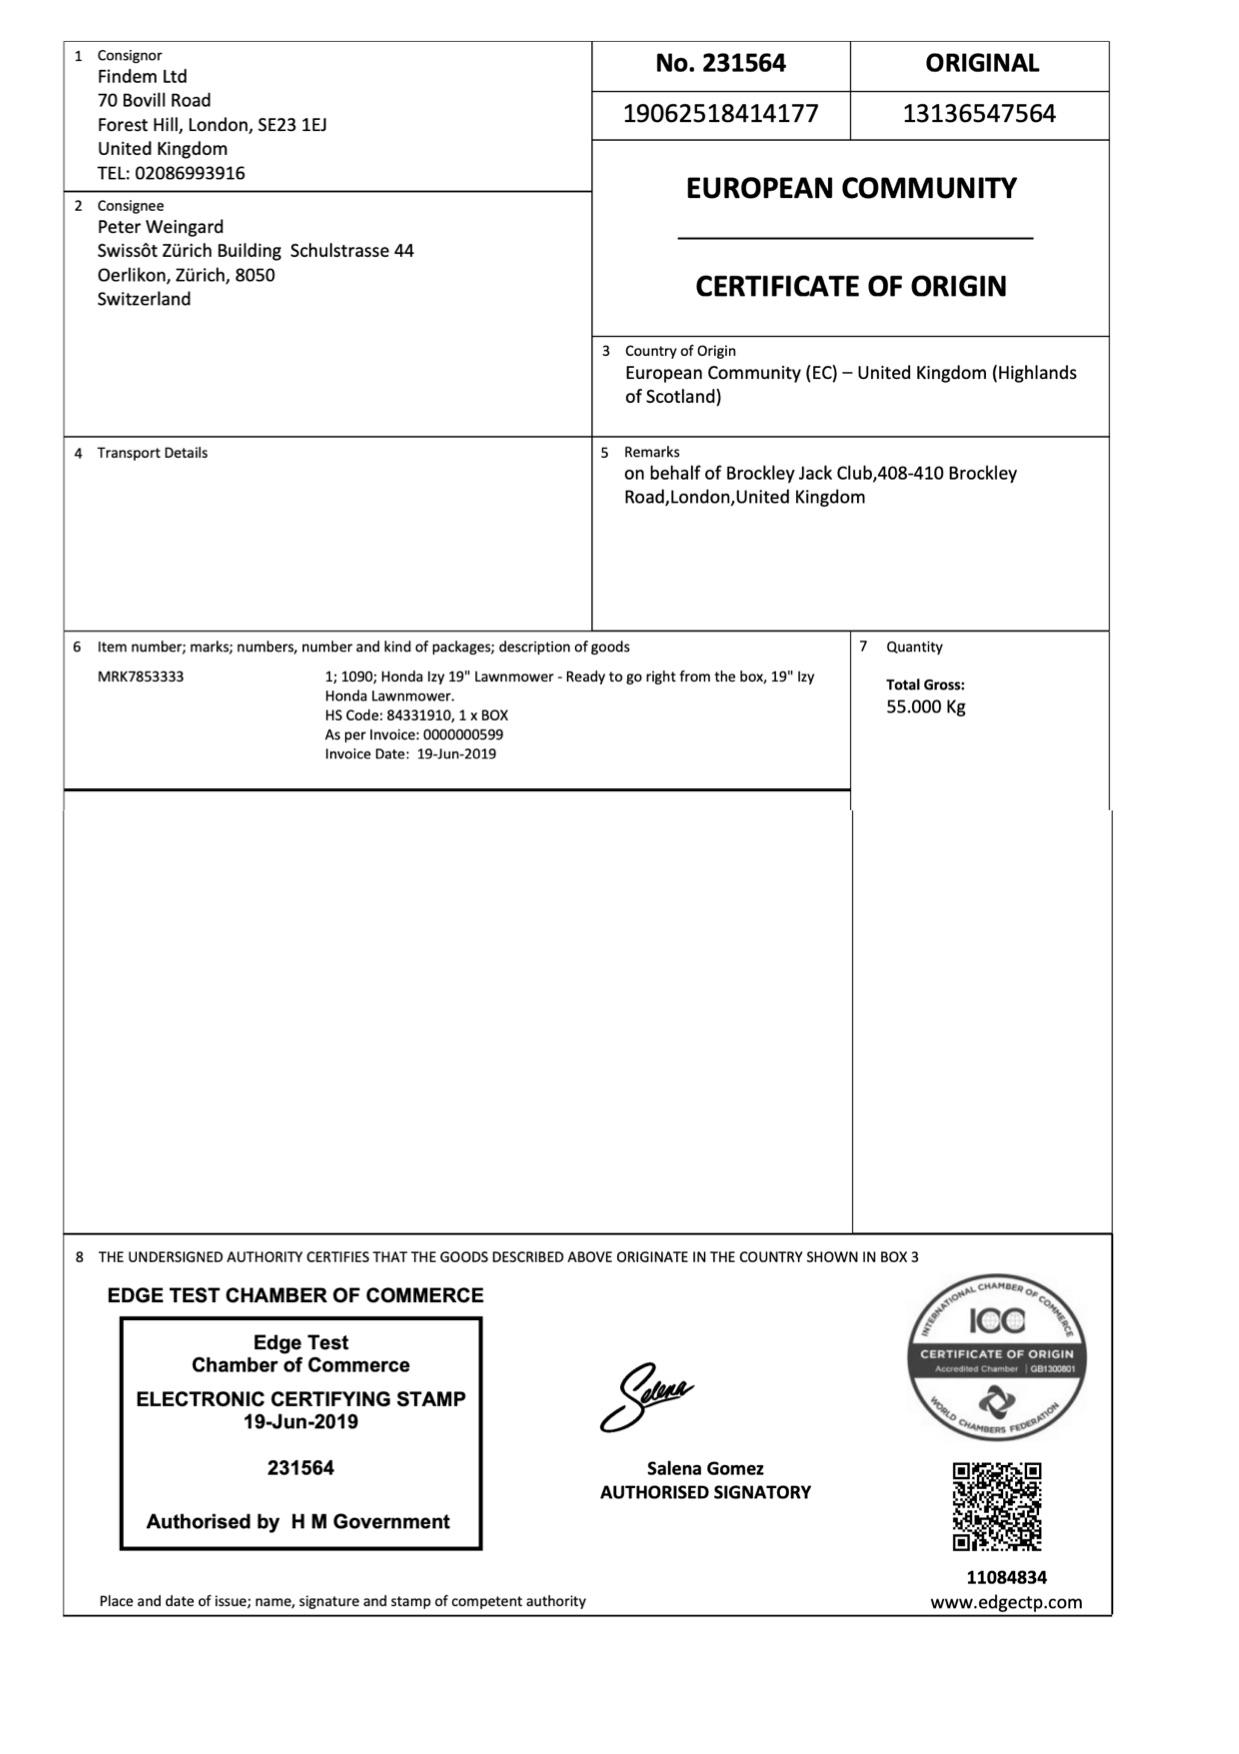 EdgeCERTS EC Certificate Of Origin